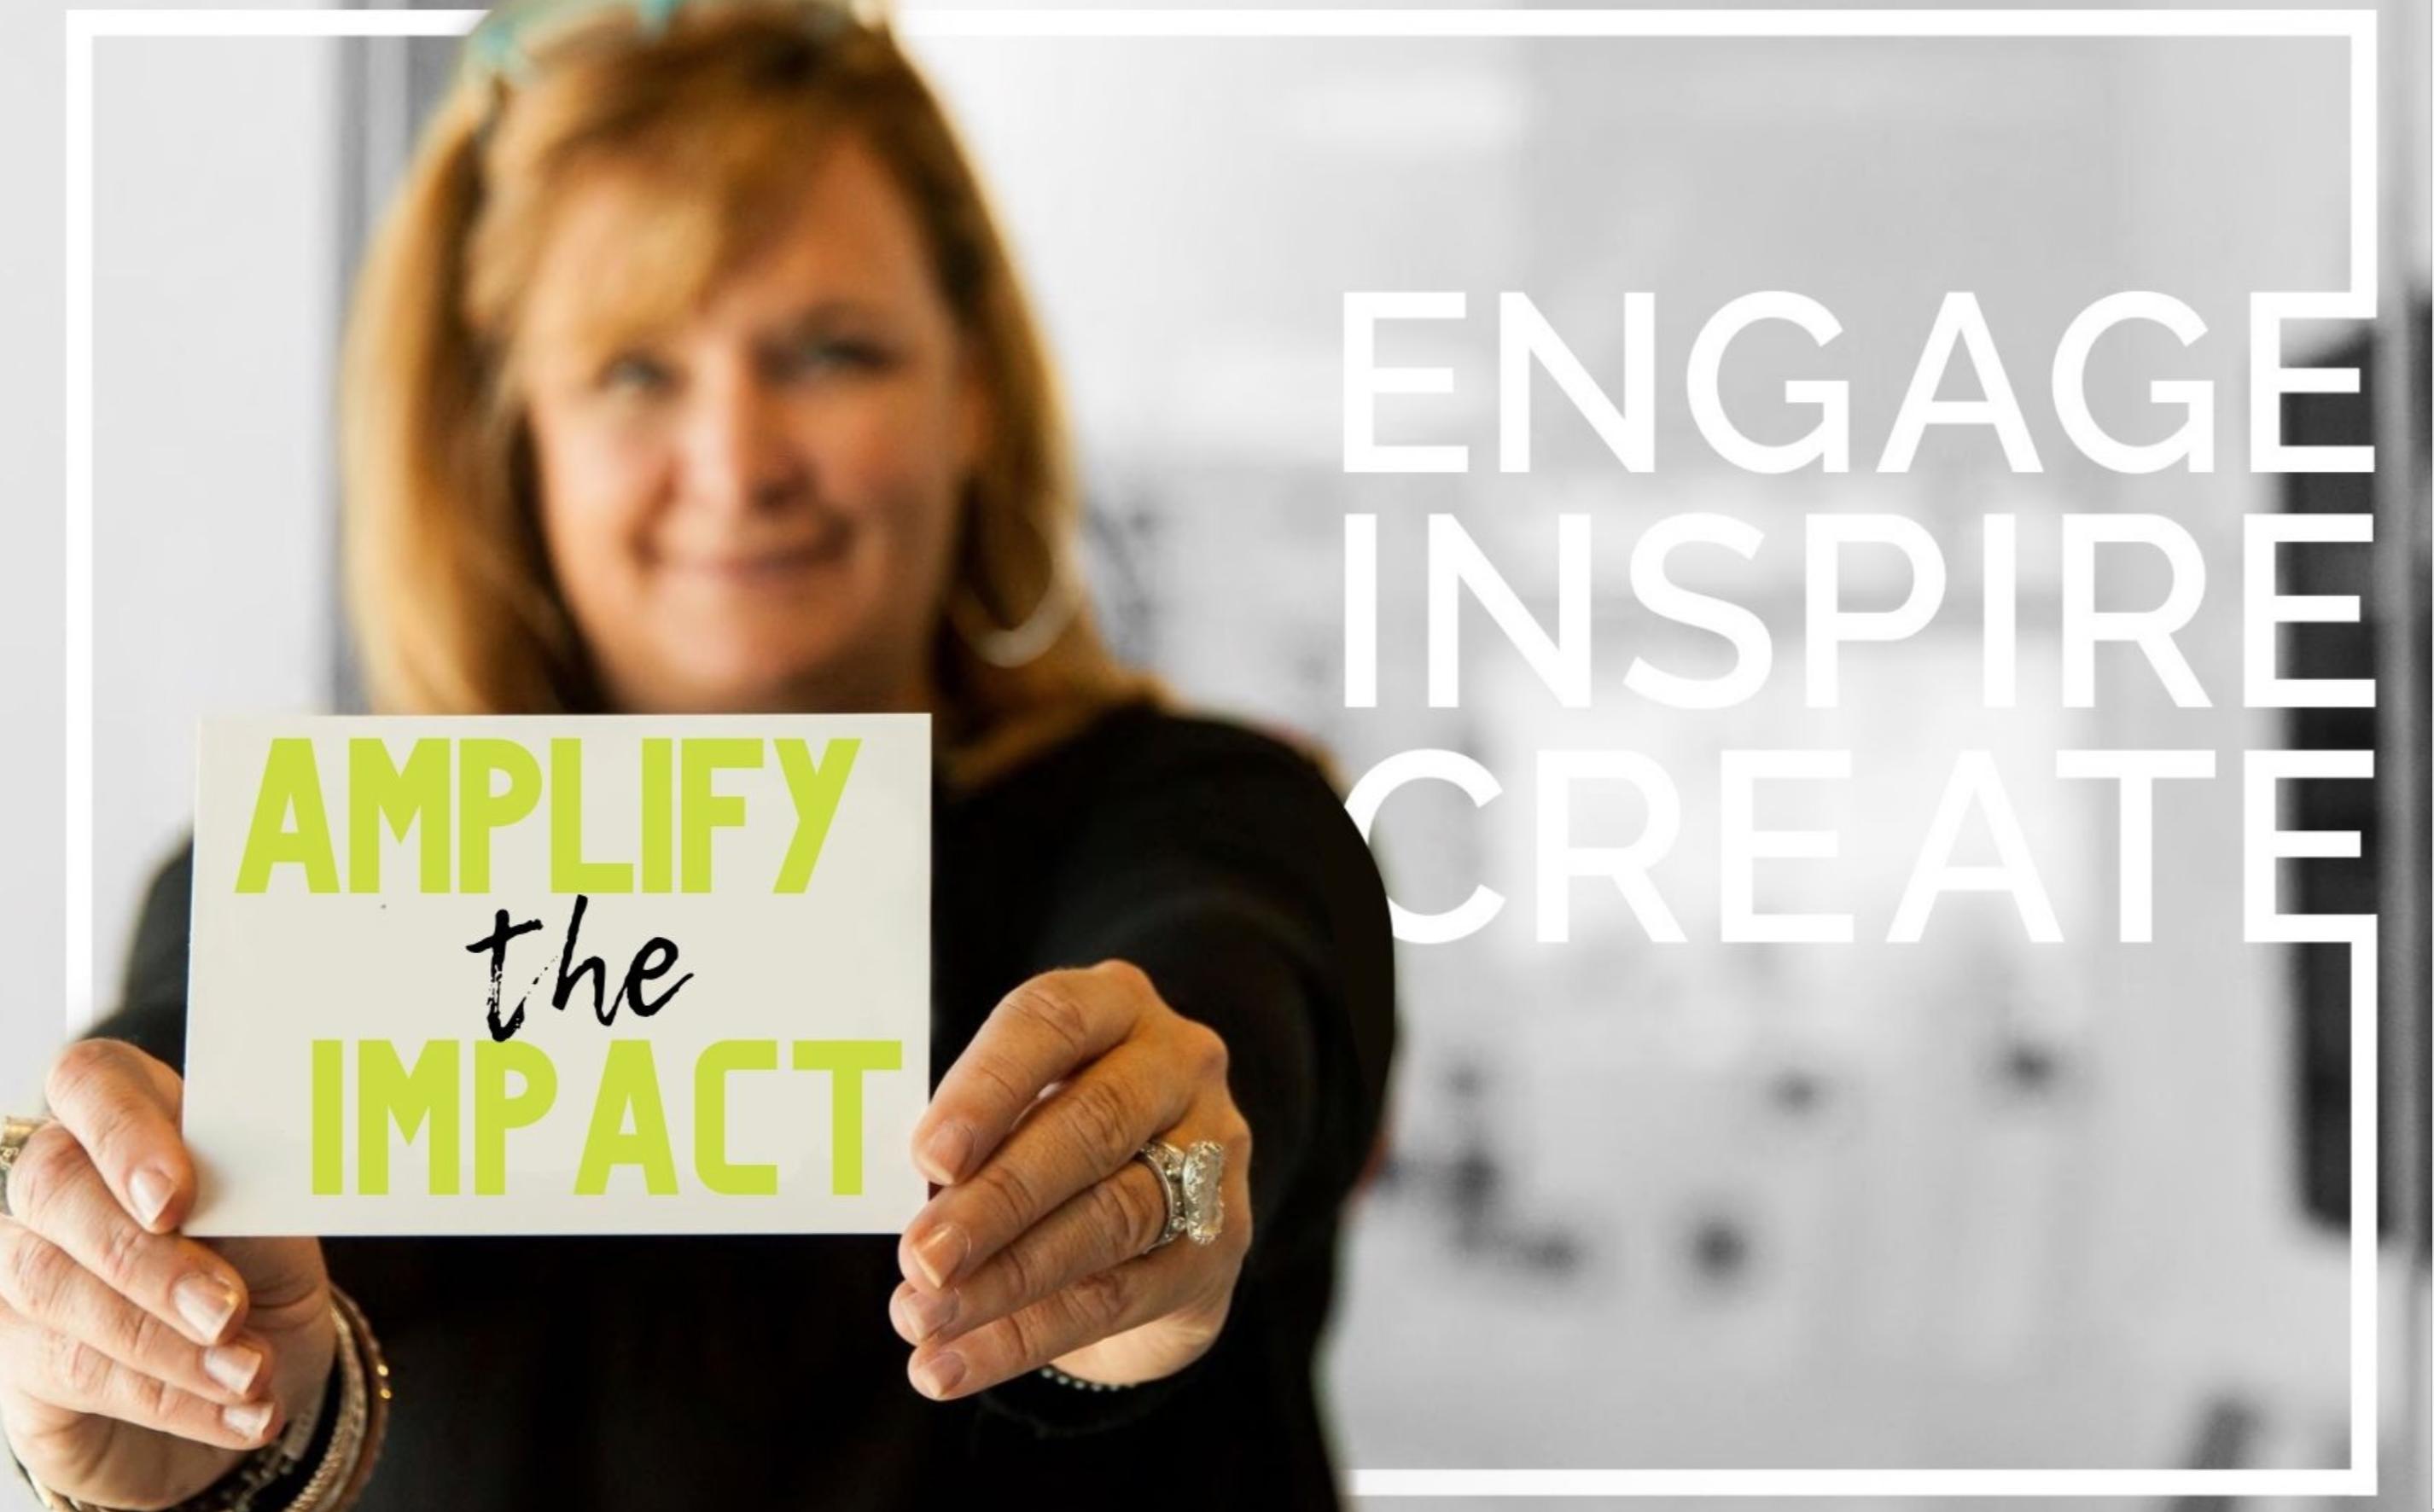 Amplify the impact